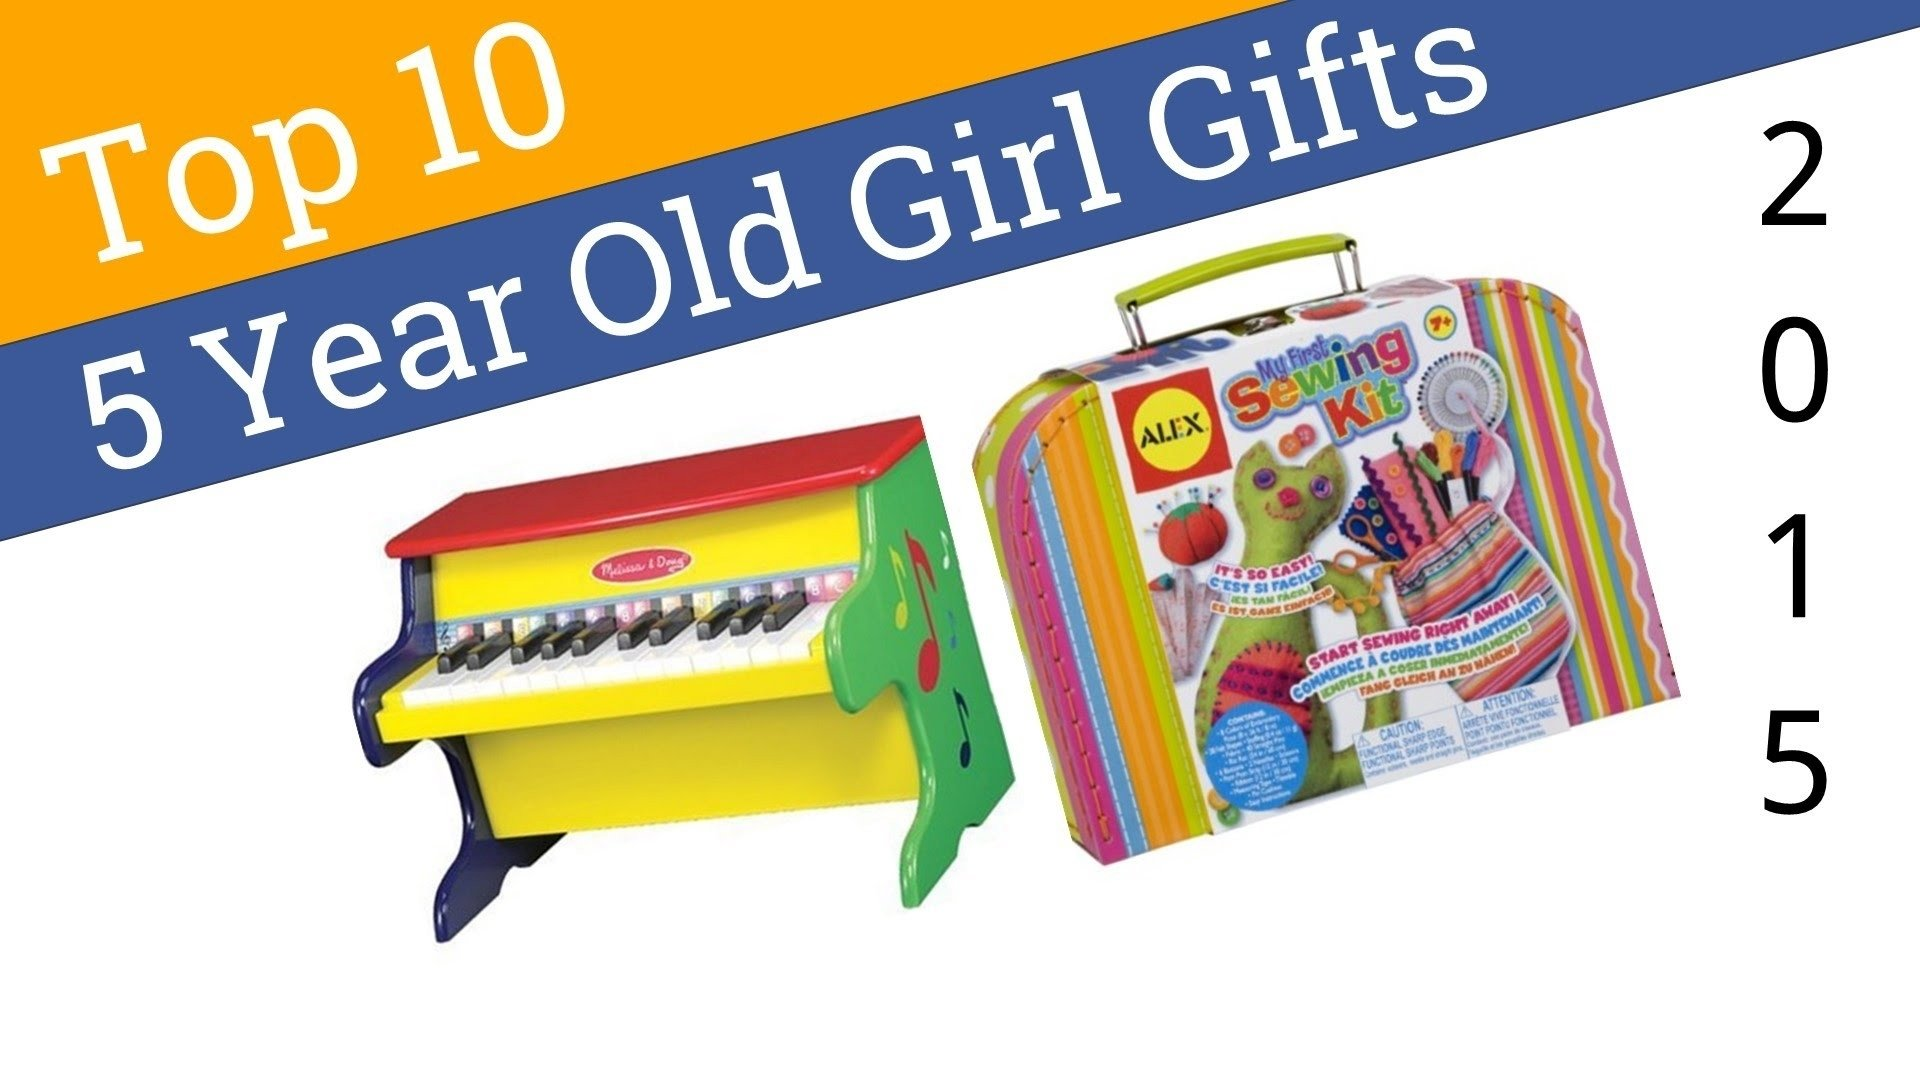 10 Fabulous 5 Year Old Girl Gift Ideas fancy birthday cake photo decoration birthday ideas birthday